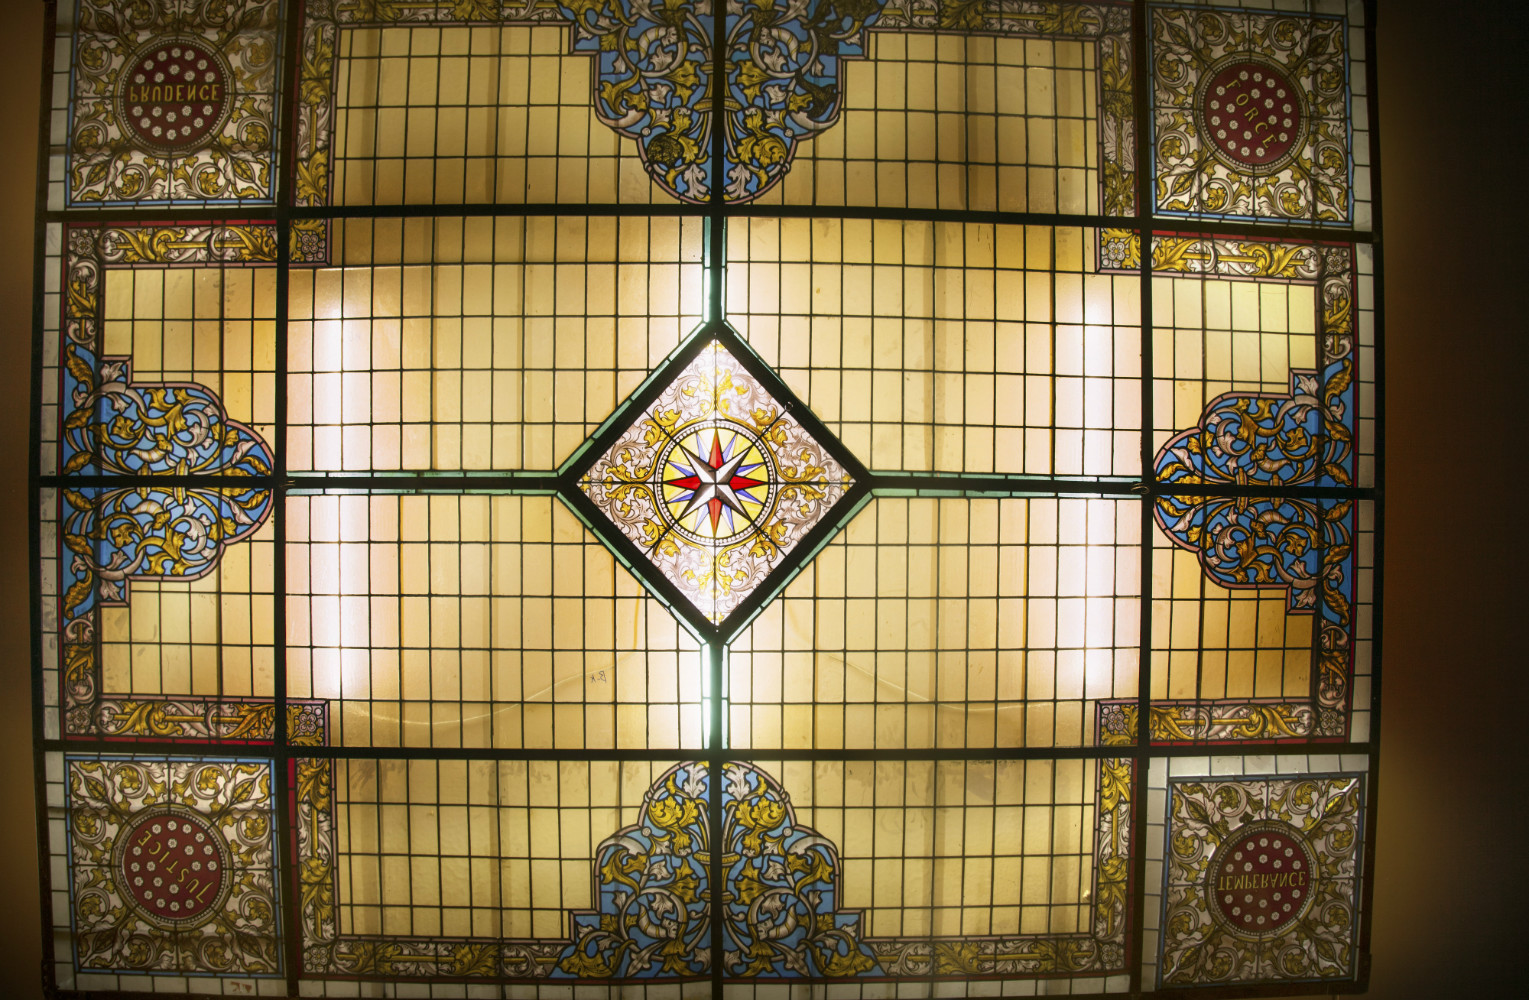 Glas In Lood Engels.Gebrandschilderd Glas In Lood Plafond 300x400 Cm Sijf Dax